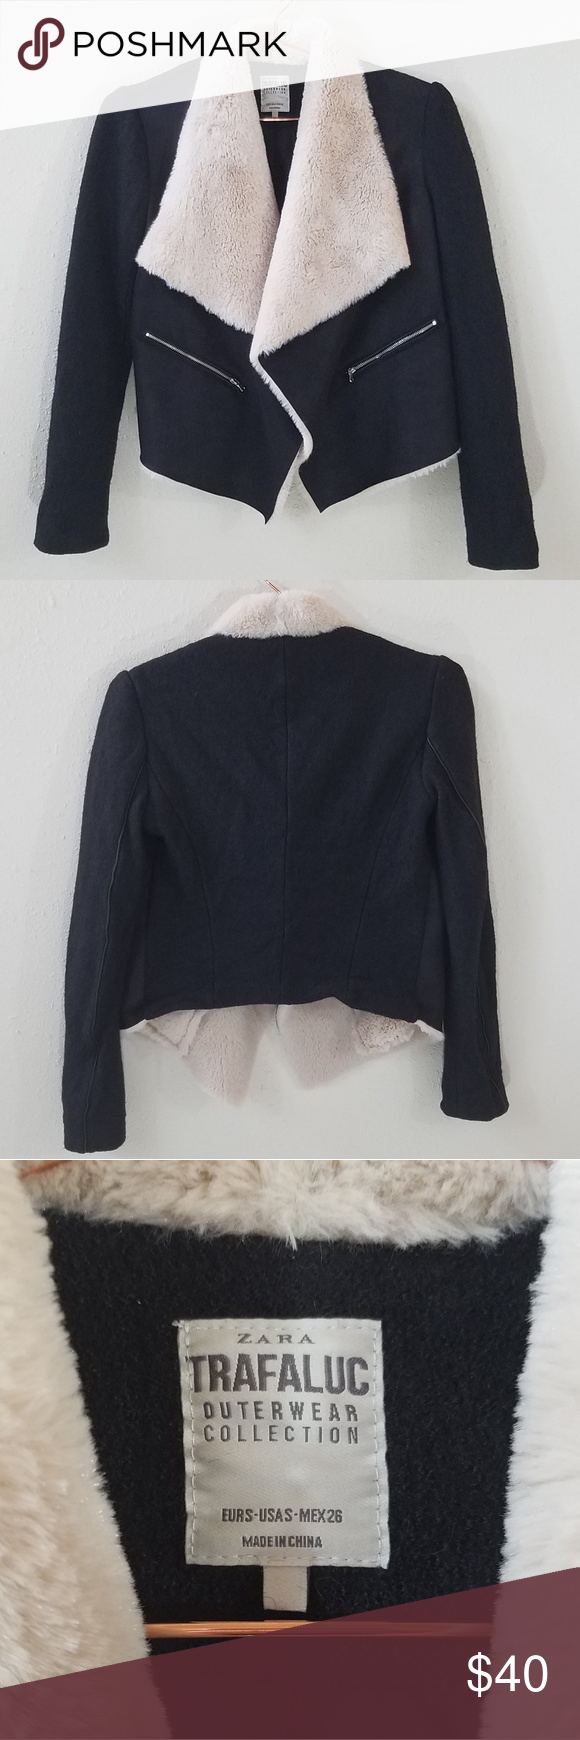 Zara Trafaluc Outerwear Jacket Size S Zara Outerwear Jackets Clothes Design [ 1740 x 580 Pixel ]